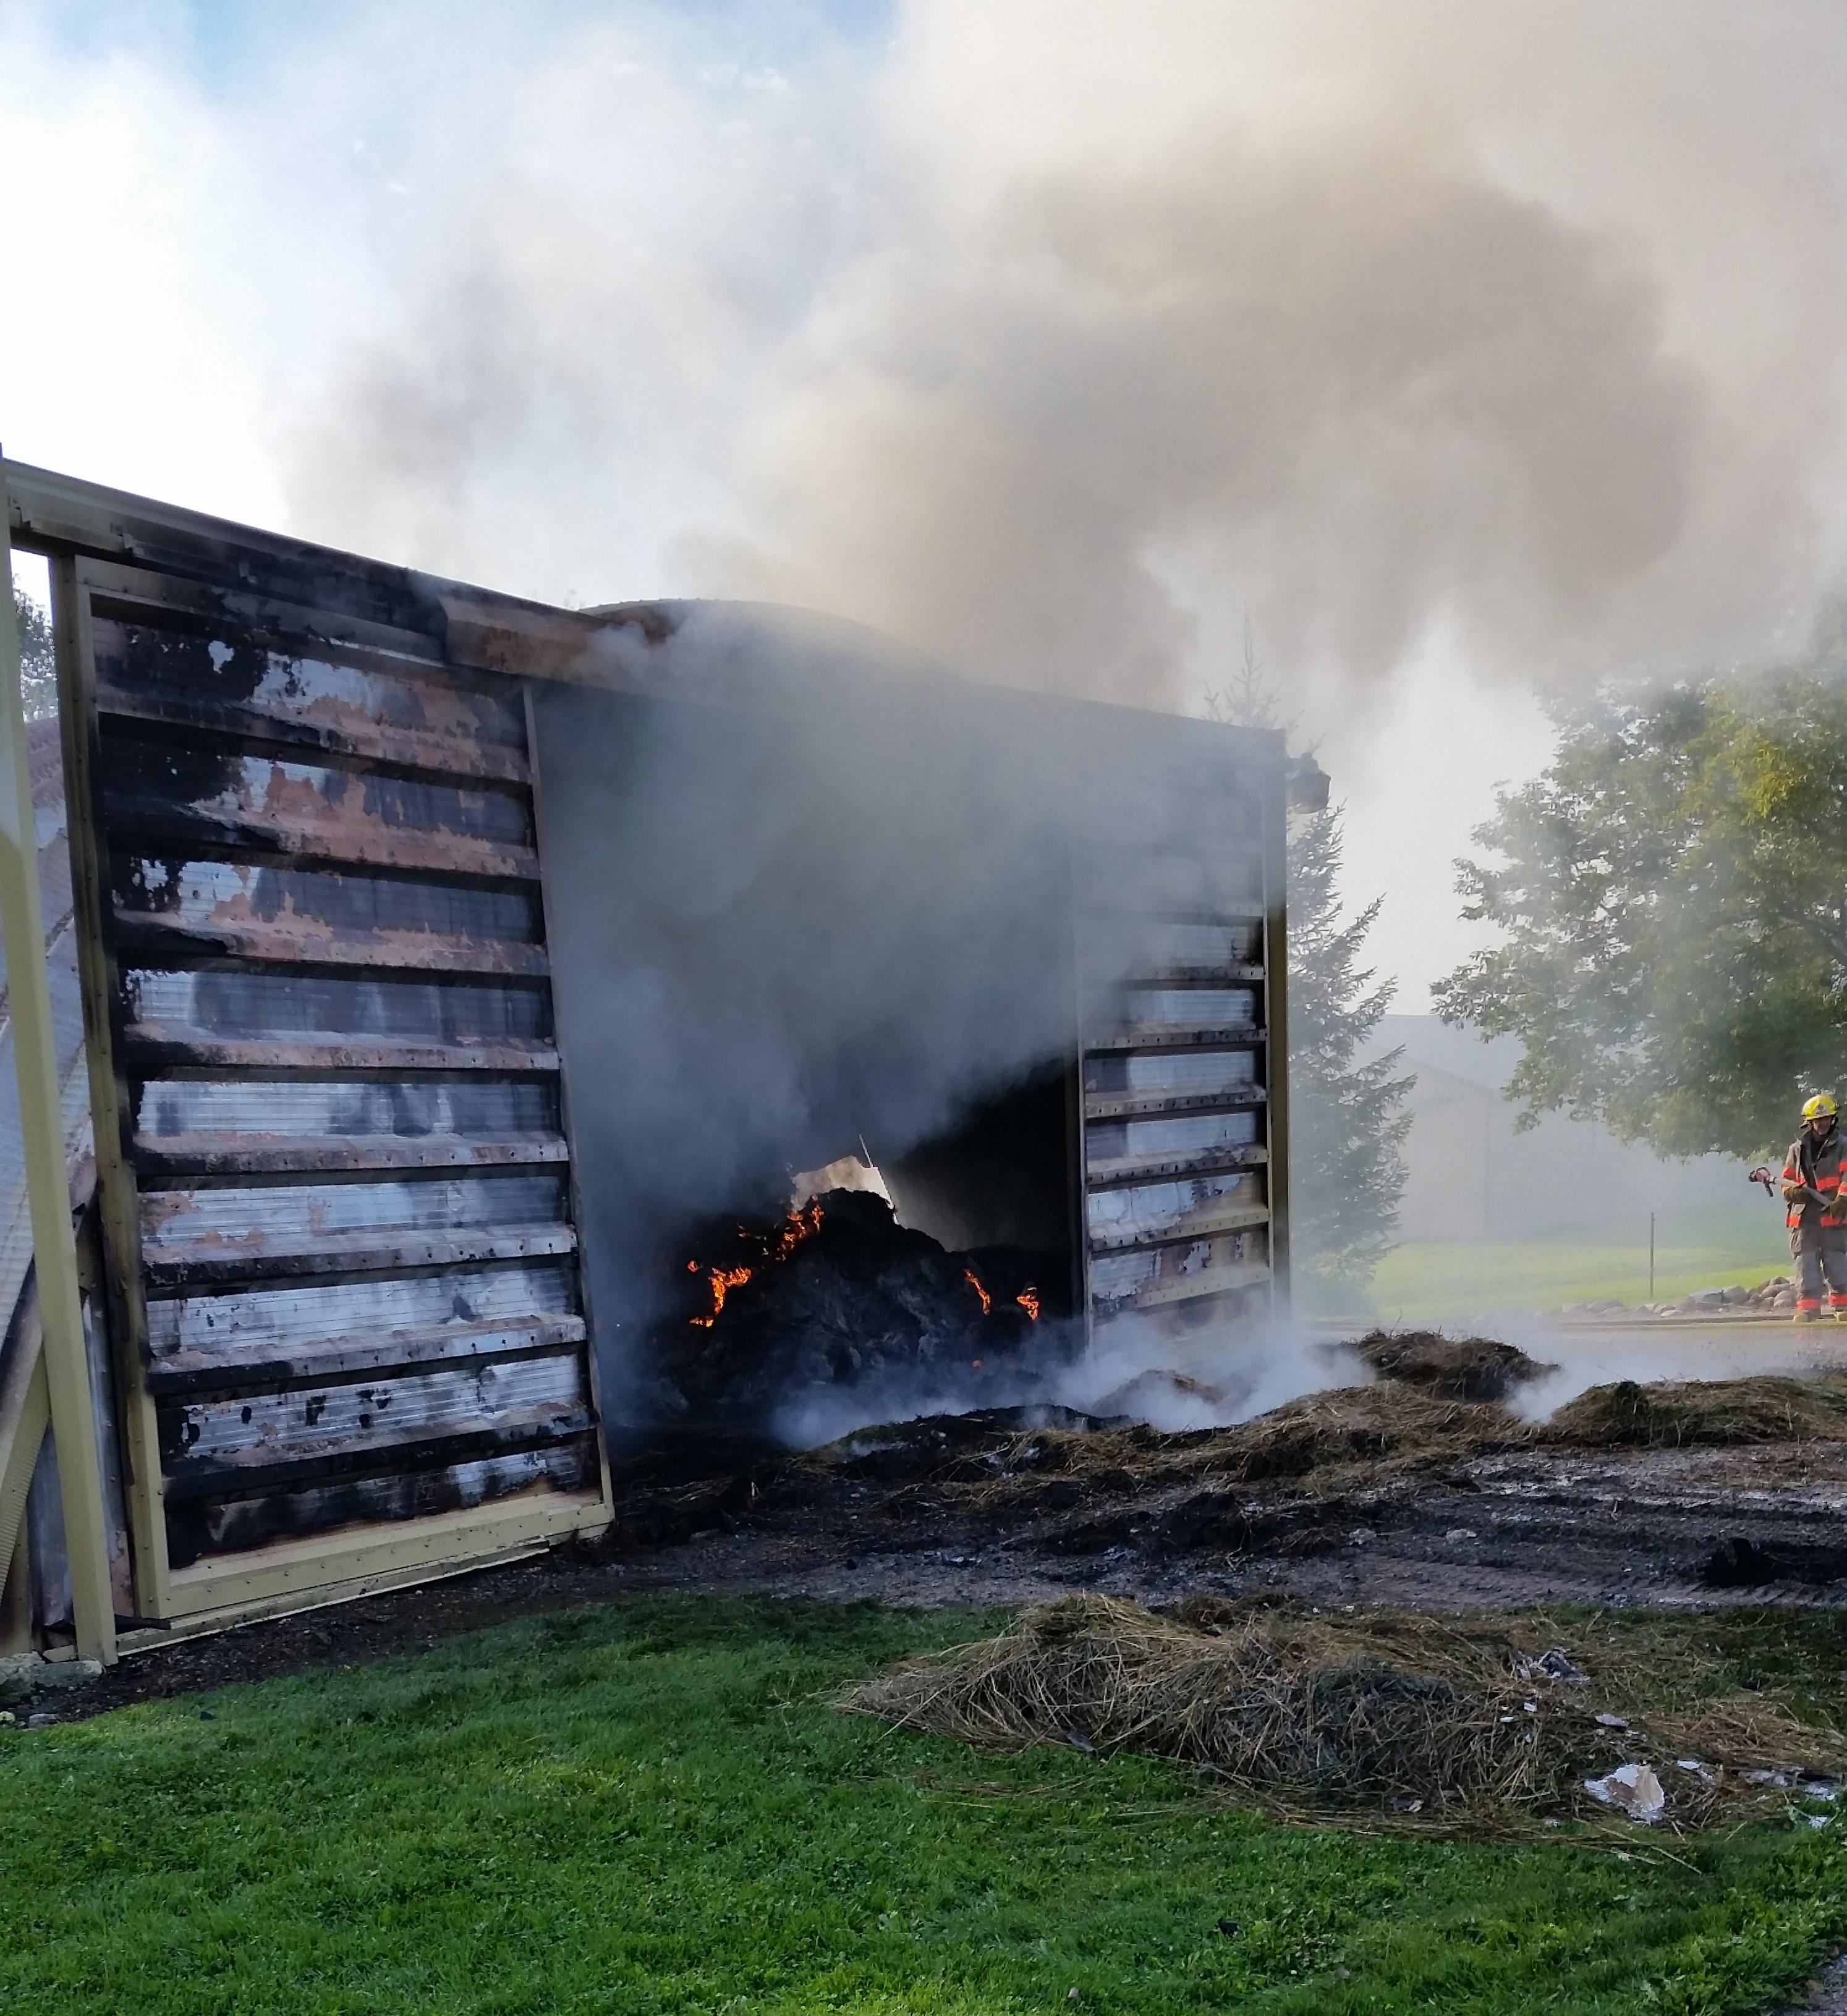 Heavy smoke billows through barn door as hay bales burn